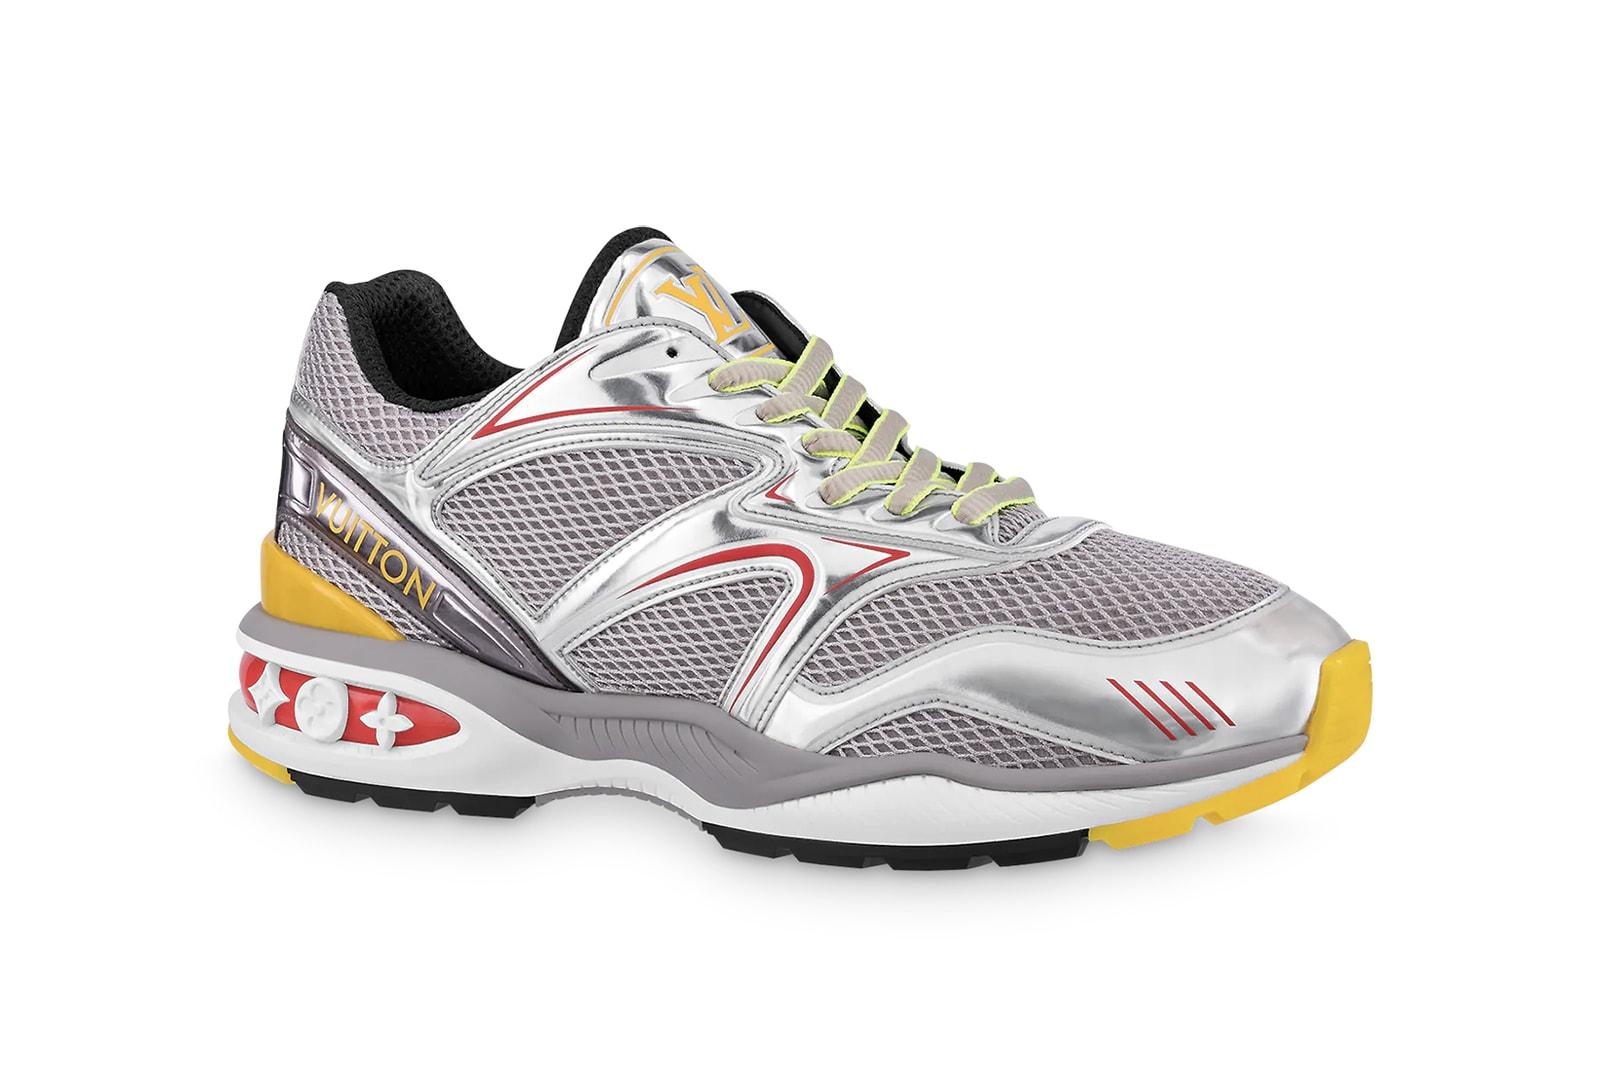 best womens winter sneakers nike air force 1 pixel gold white sneakerhead shoes footwear